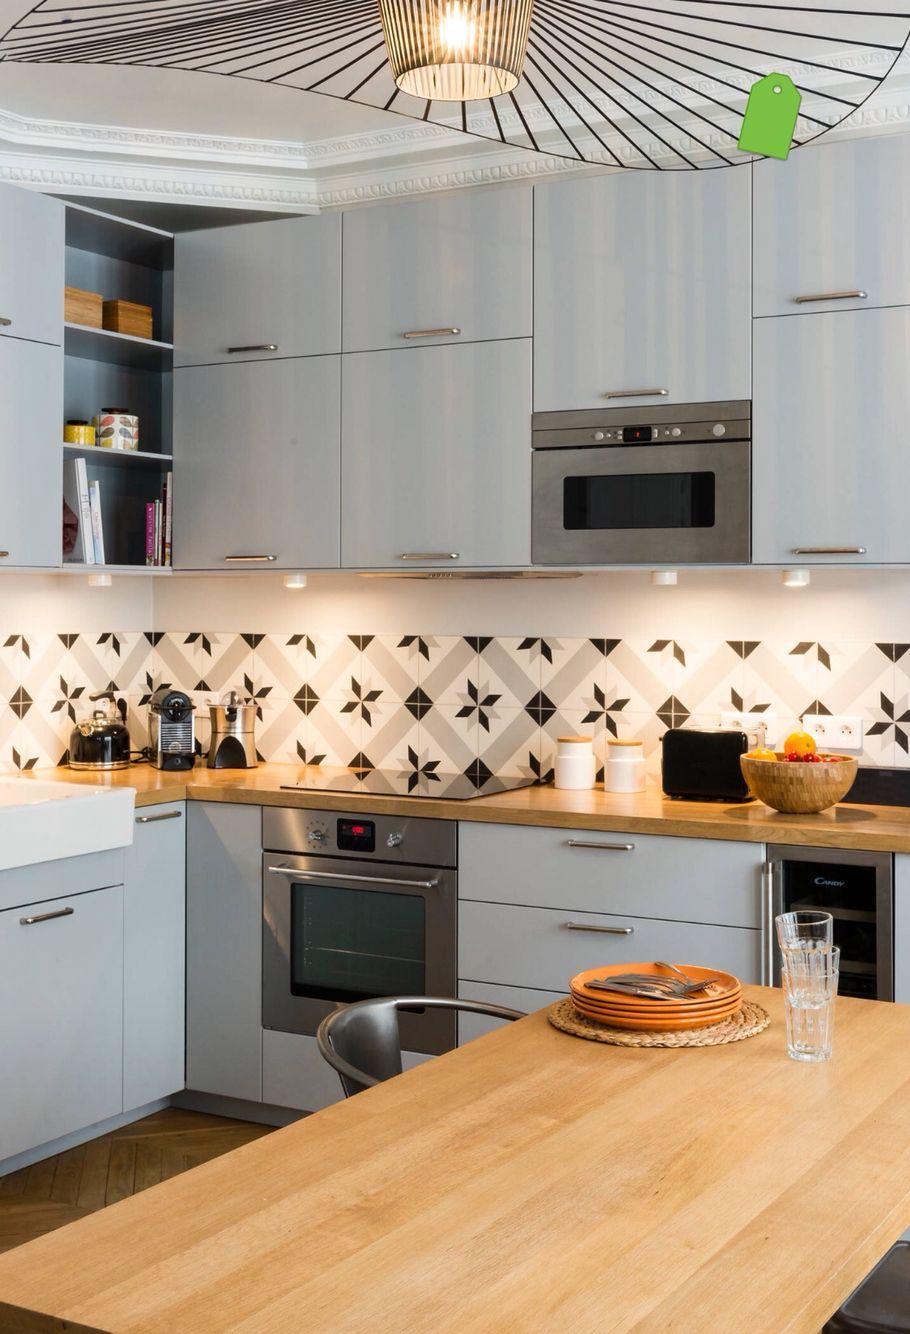 Credence carreau ciment cuisine cuisine gris cuisine carreaux de ciment et id e d co cuisine - Cuisine carreau de ciment ...